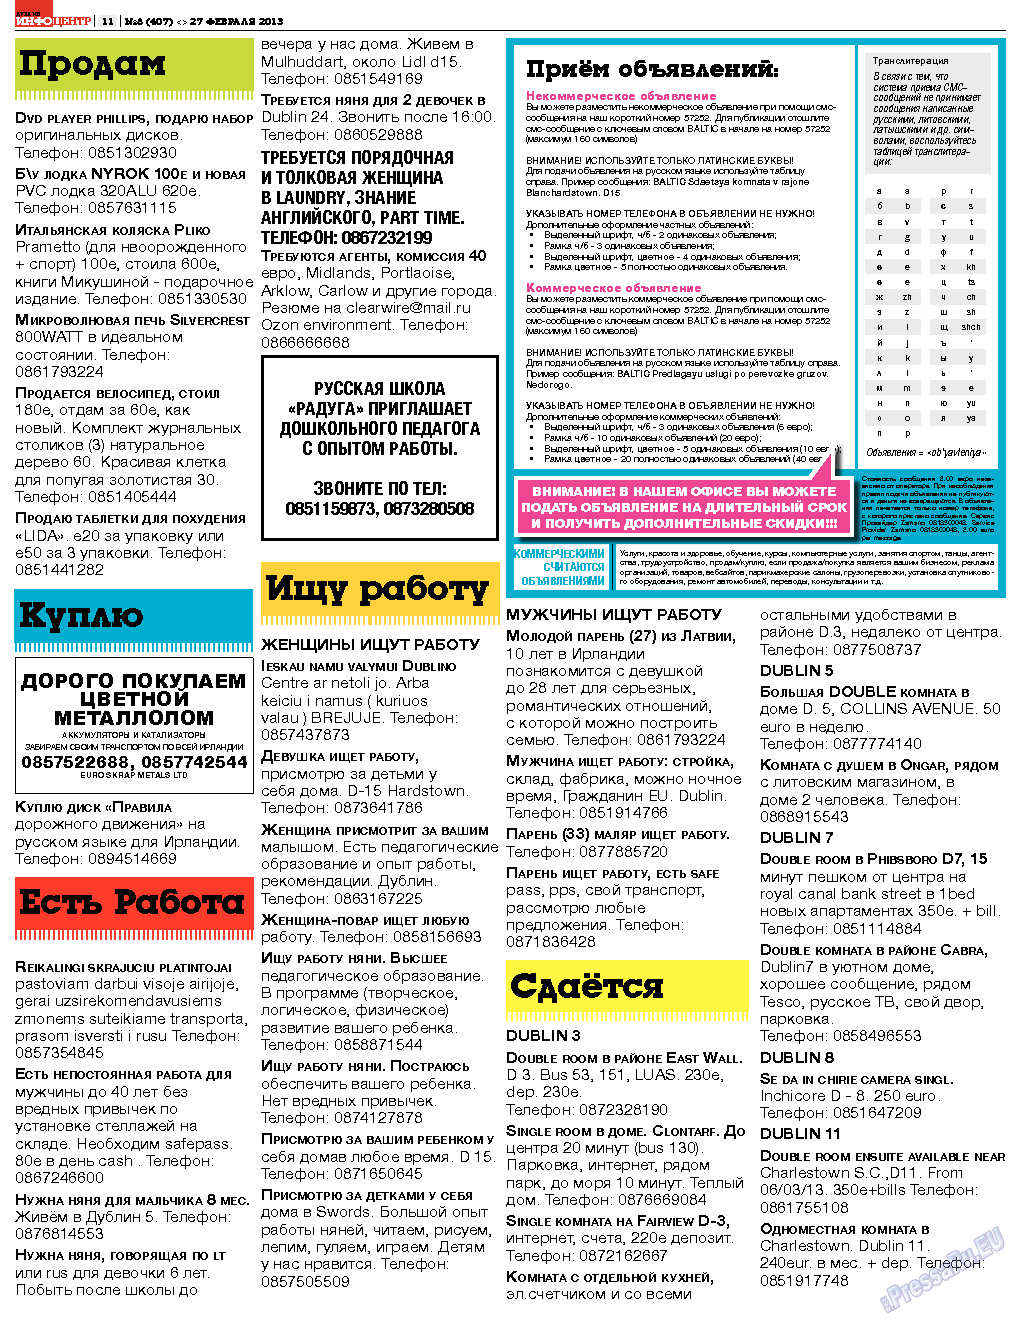 Дублин инфоцентр (газета). 2013 год, номер 8, стр. 11